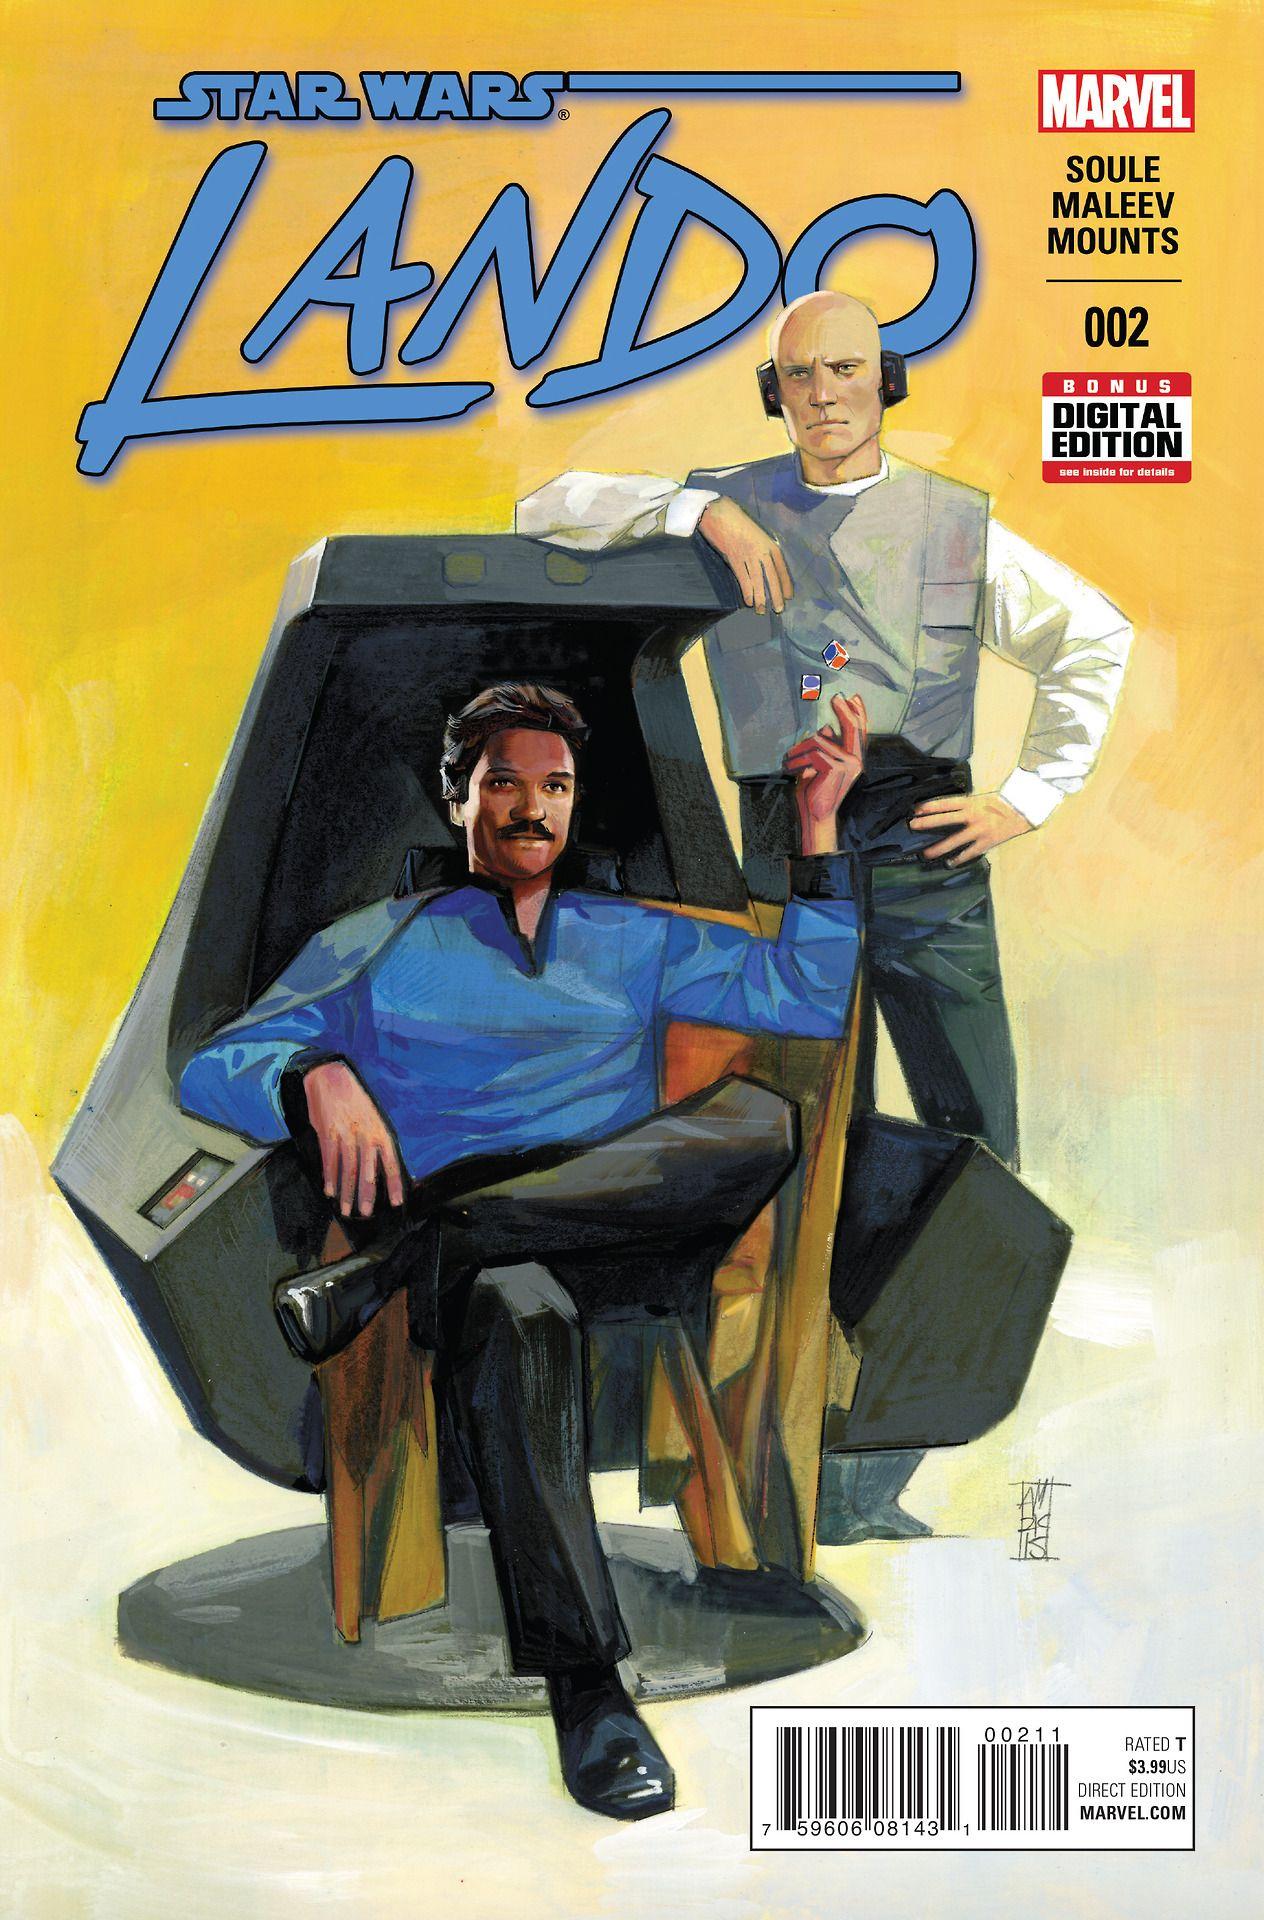 Star Wars Lando Calrissian (Billy Dee Williams)